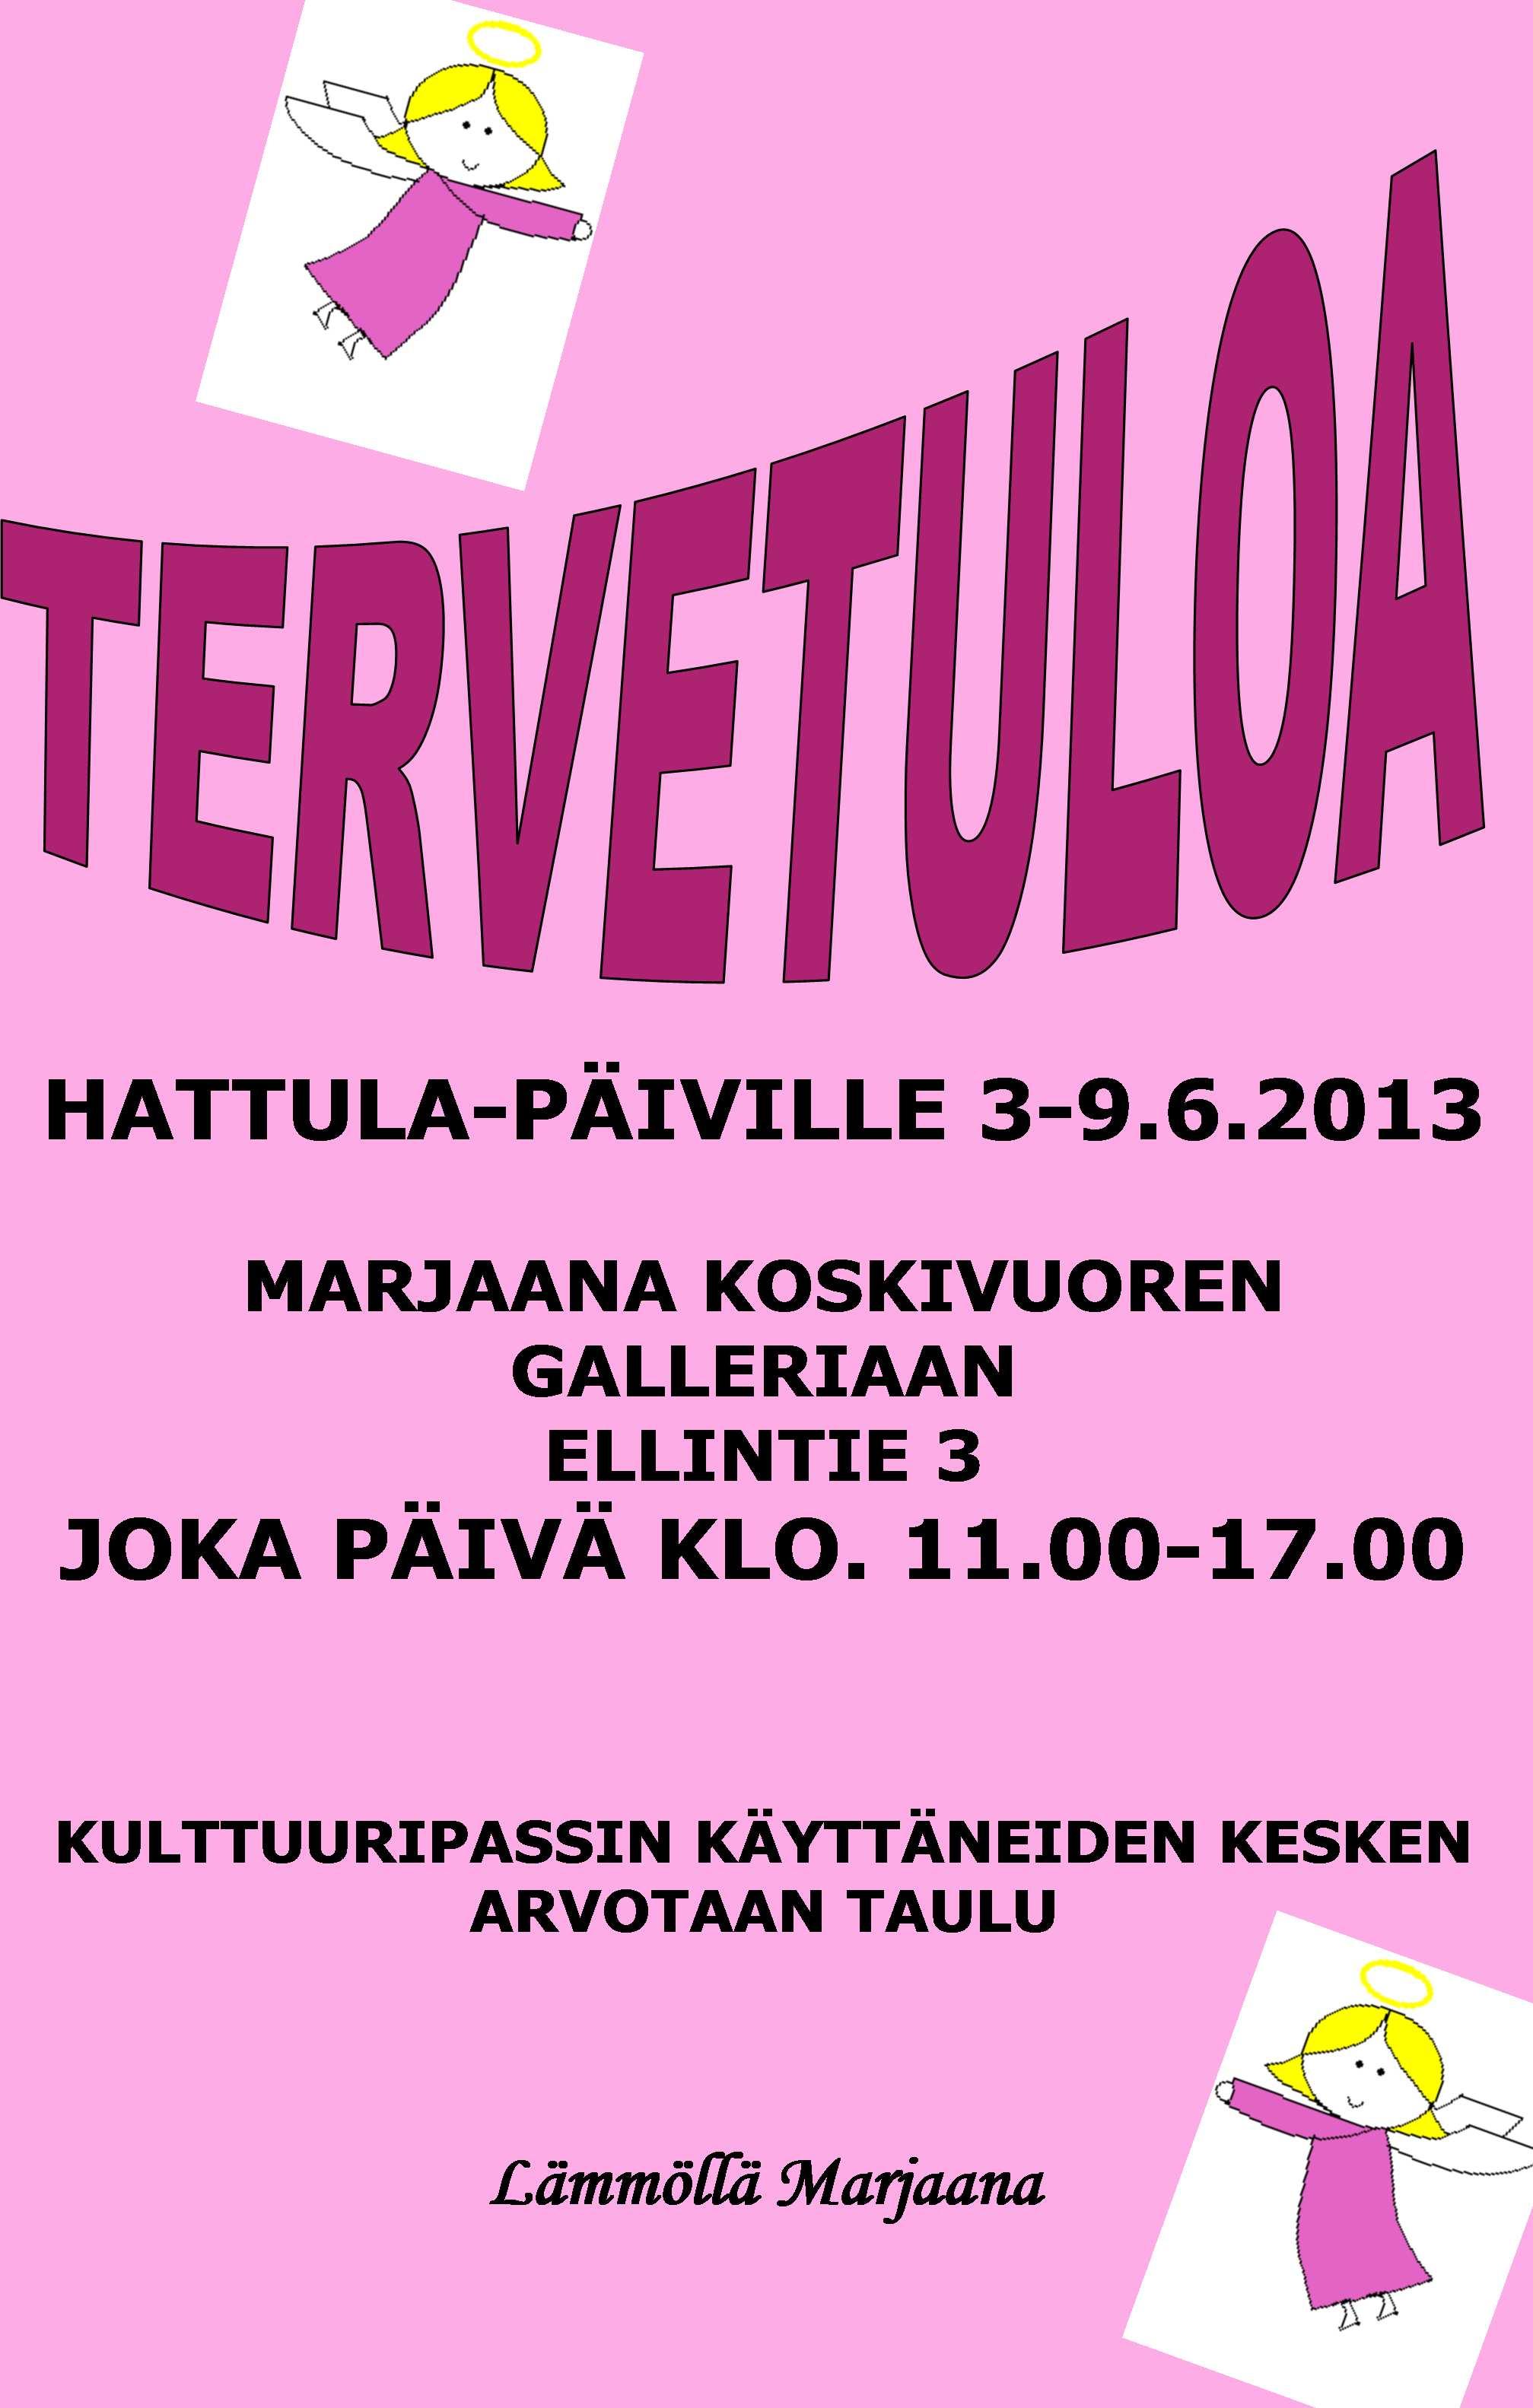 hattula_-pivt